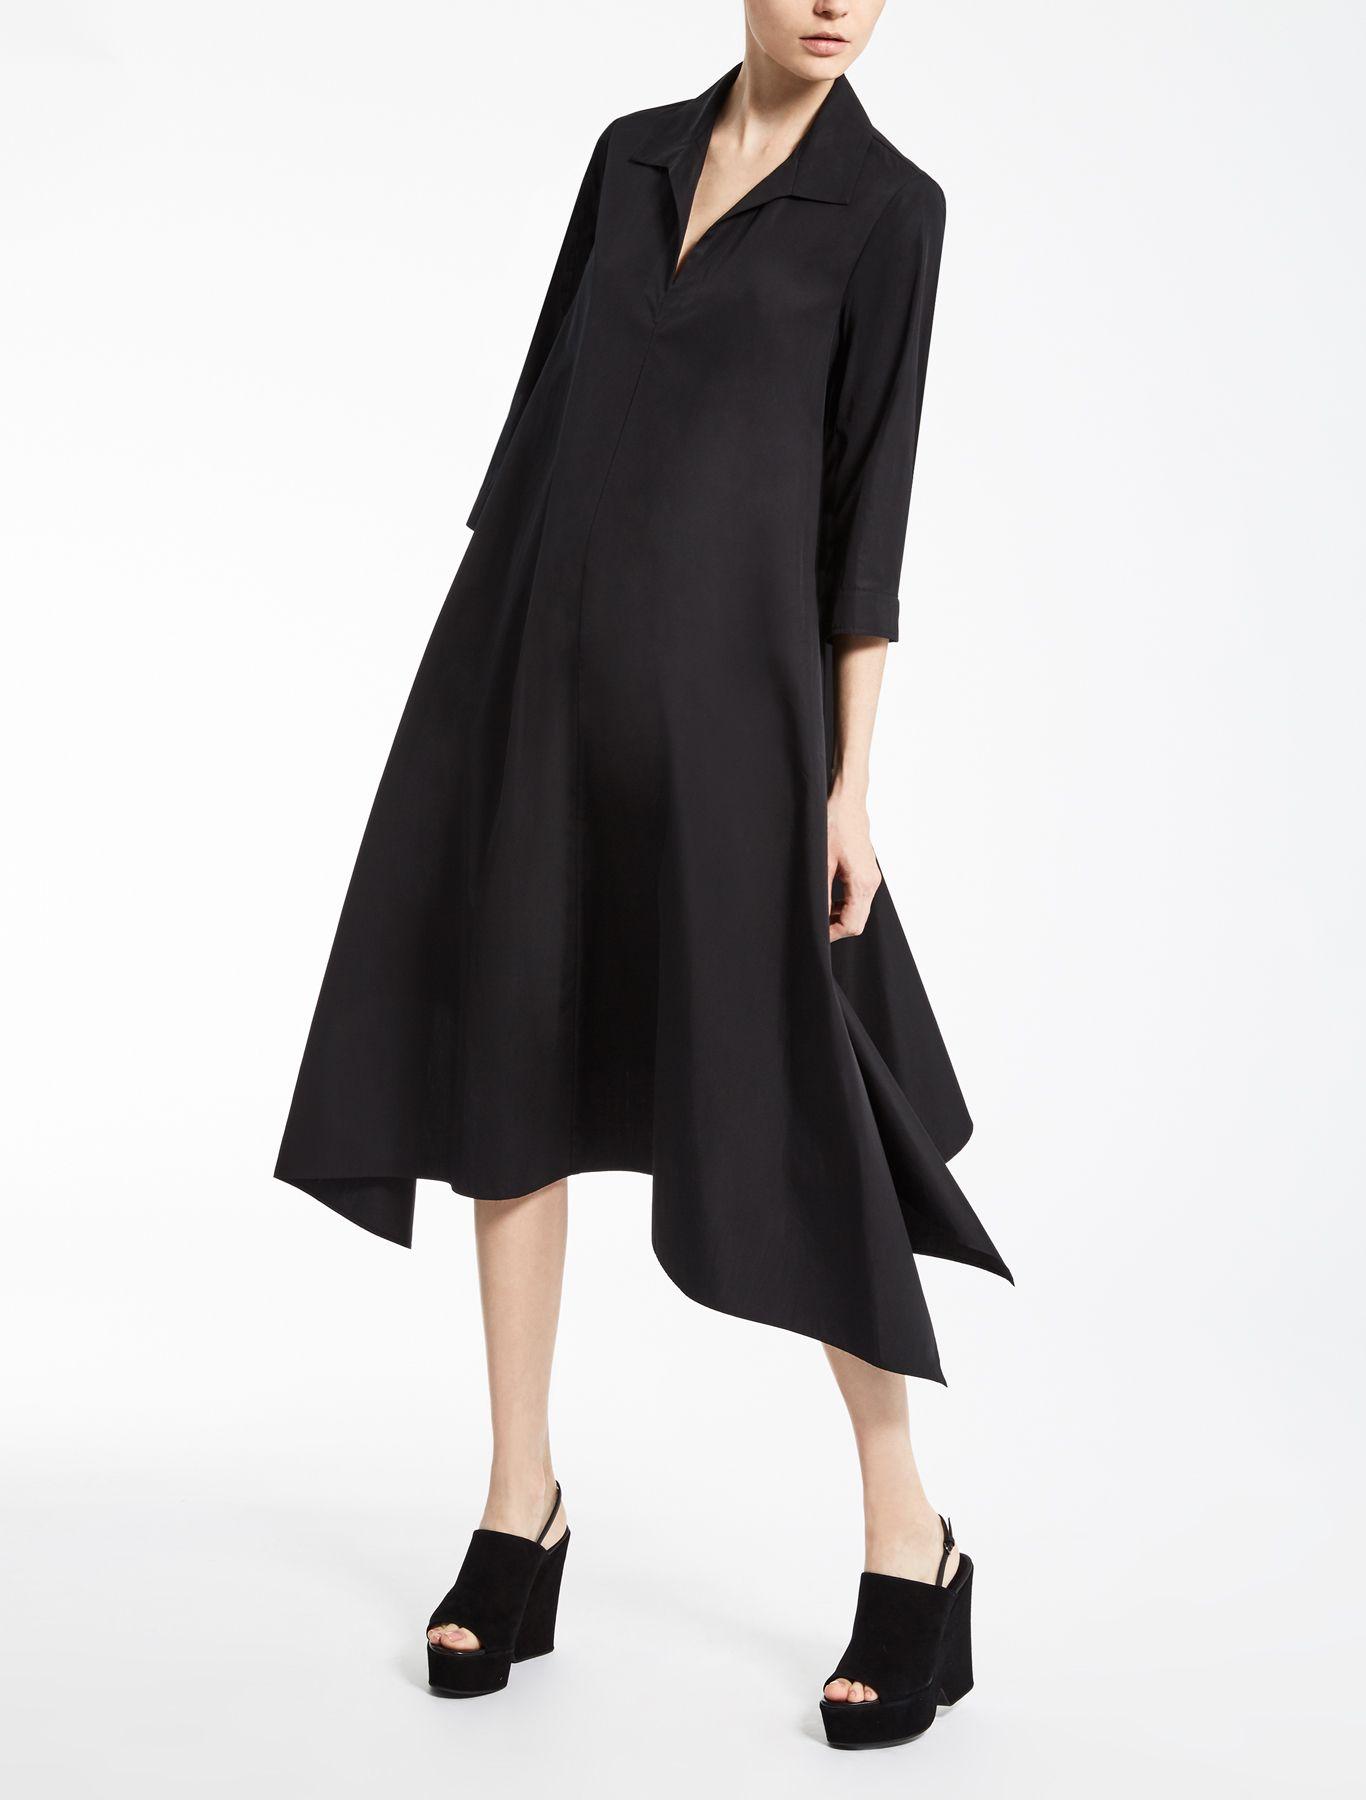 Max Mara Liriche Black Cotton Poplin Dress Cotton Poplin Dress Dresses Cotton Poplin [ 1800 x 1366 Pixel ]